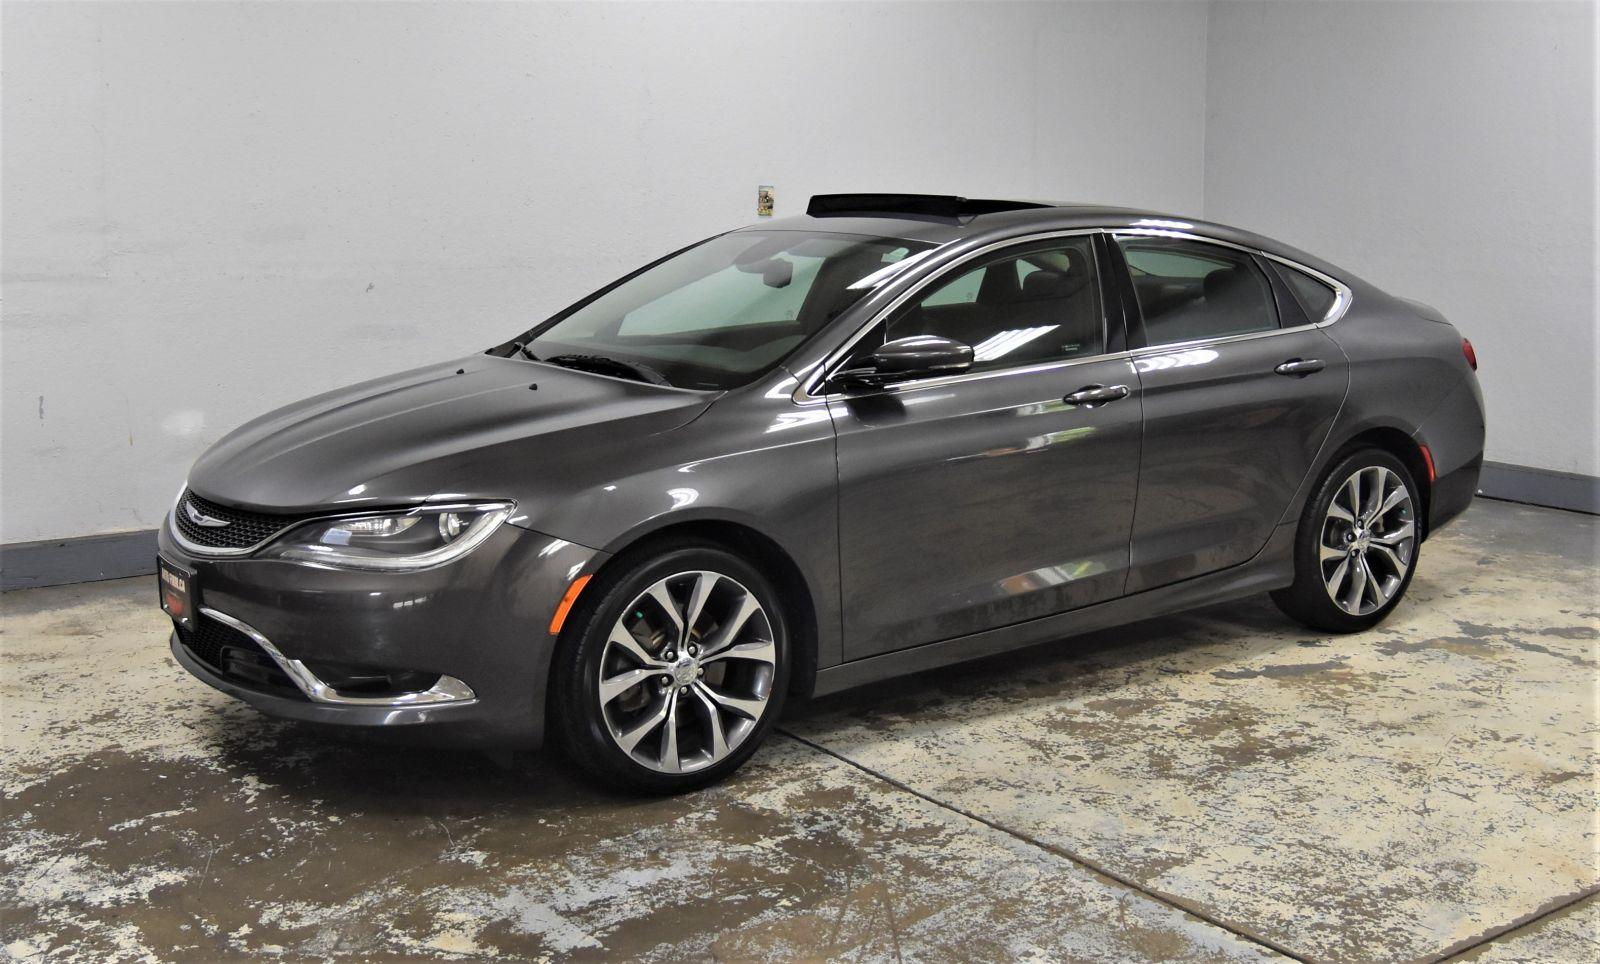 2016 Chrysler 200 Image